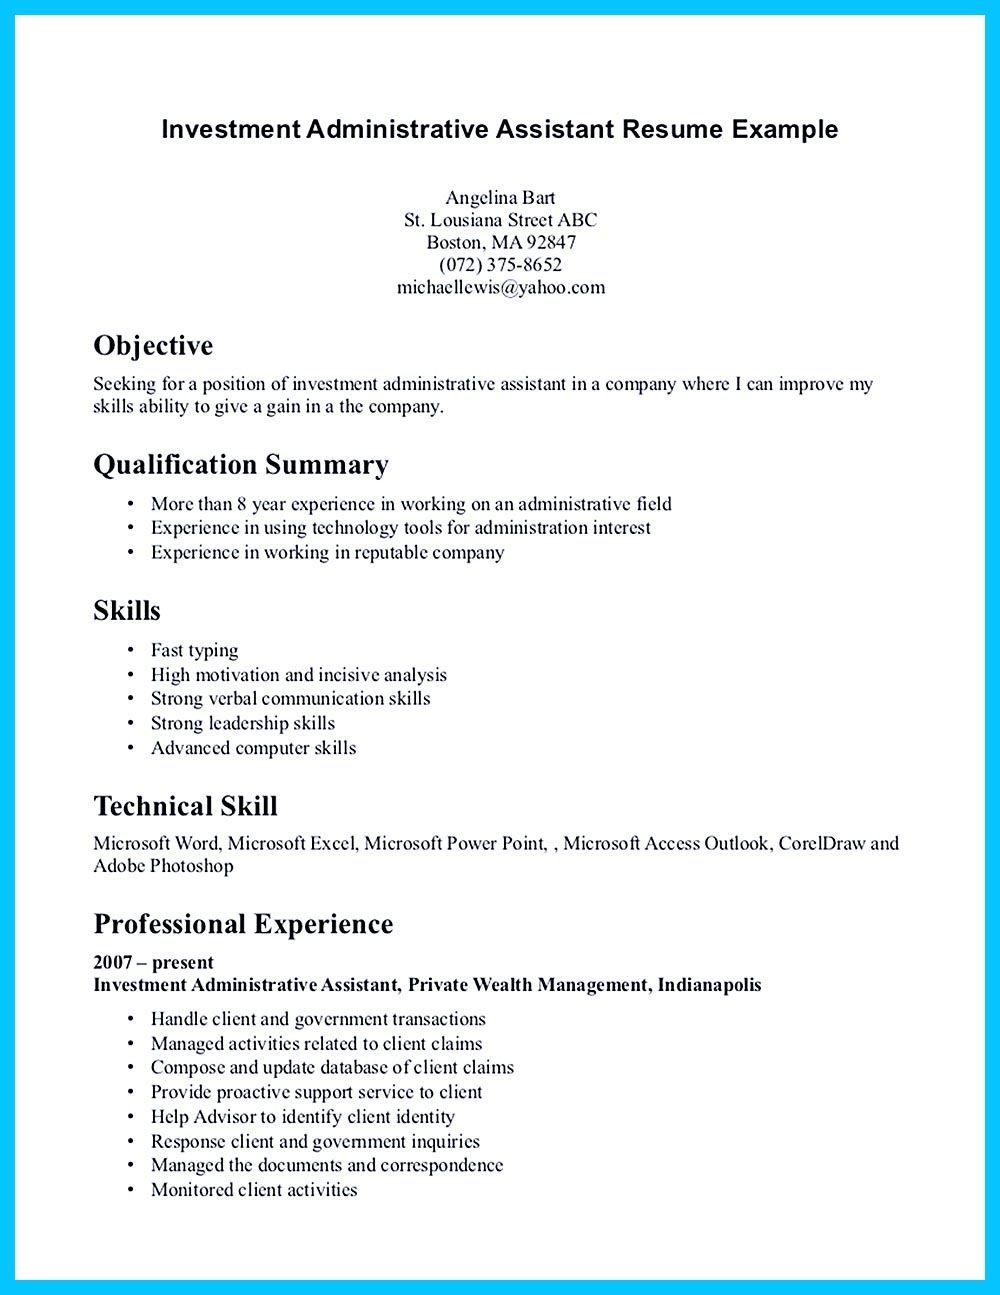 High Quality Entry Level Administrative Assistant Resume Samples Como Hacer Cortazar Trabajo